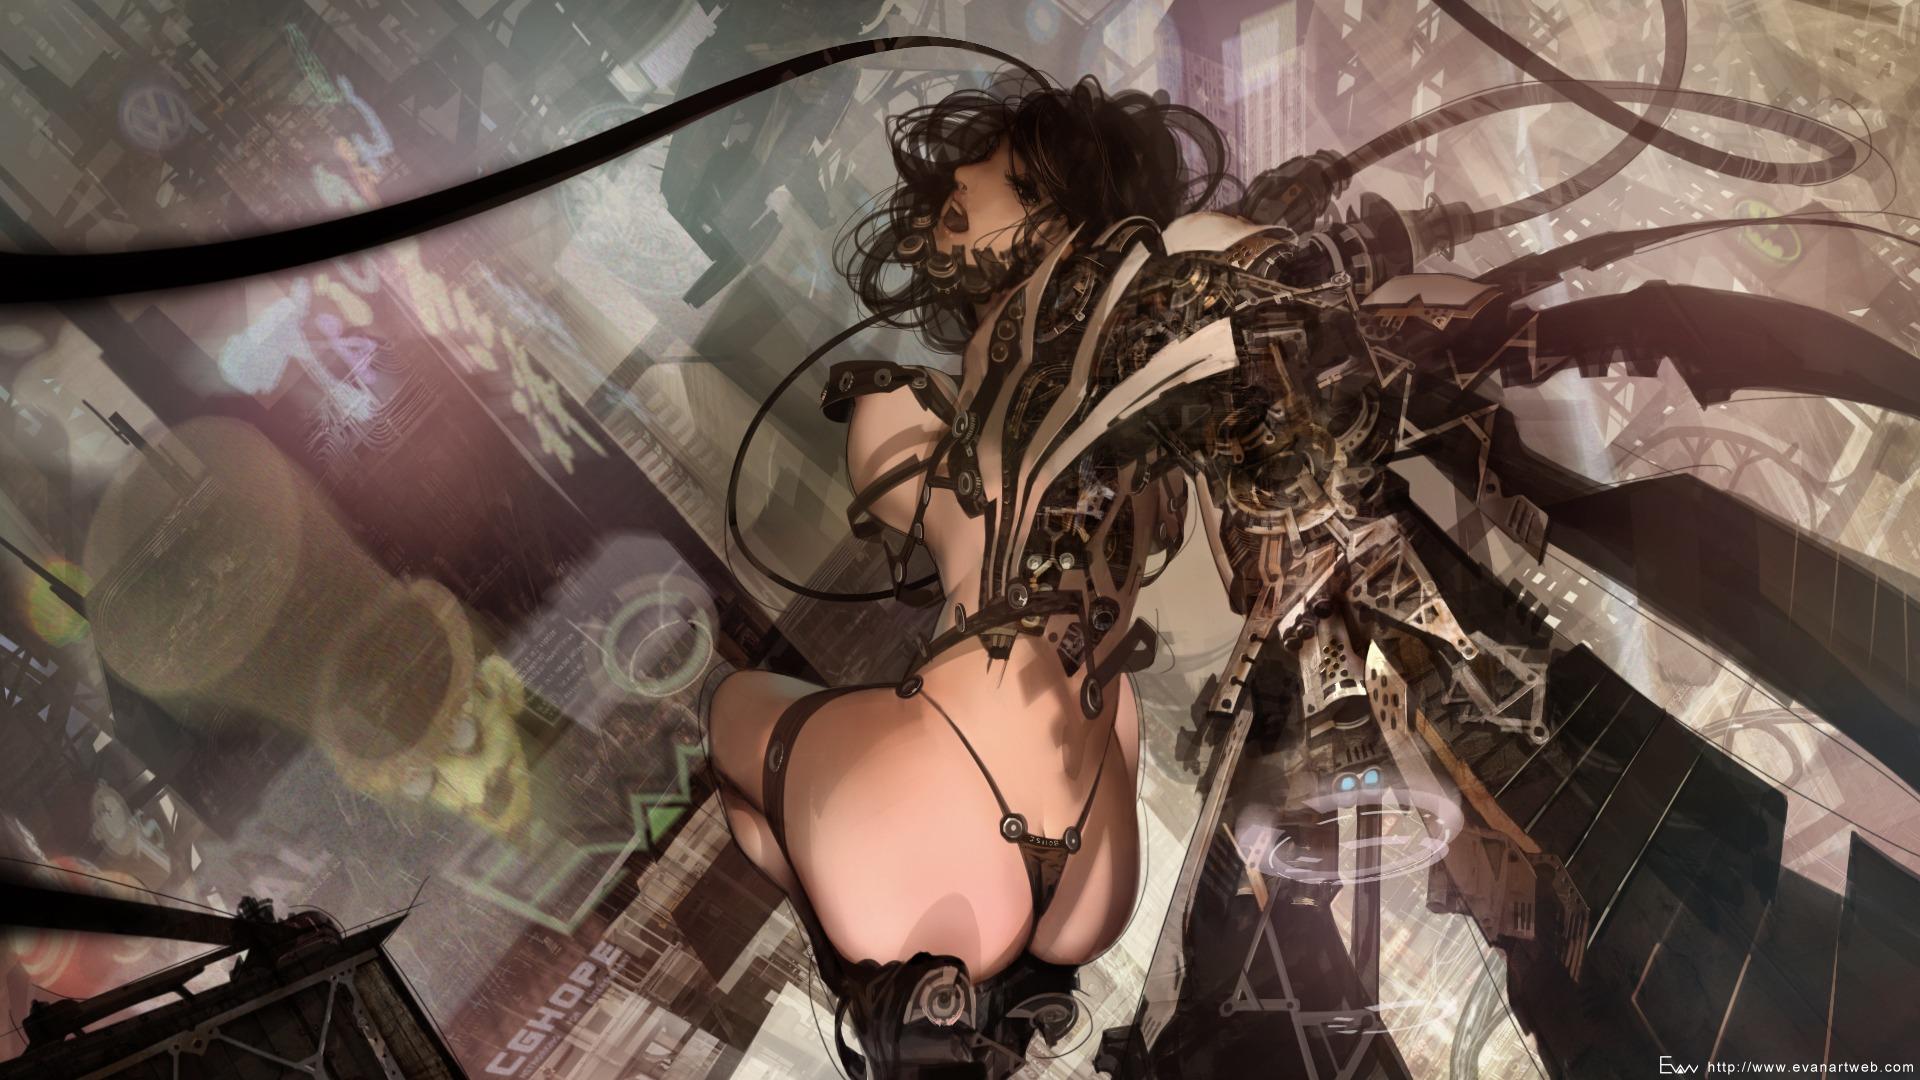 Sci fi fantasy nude girl art wallpapers hentia scenes